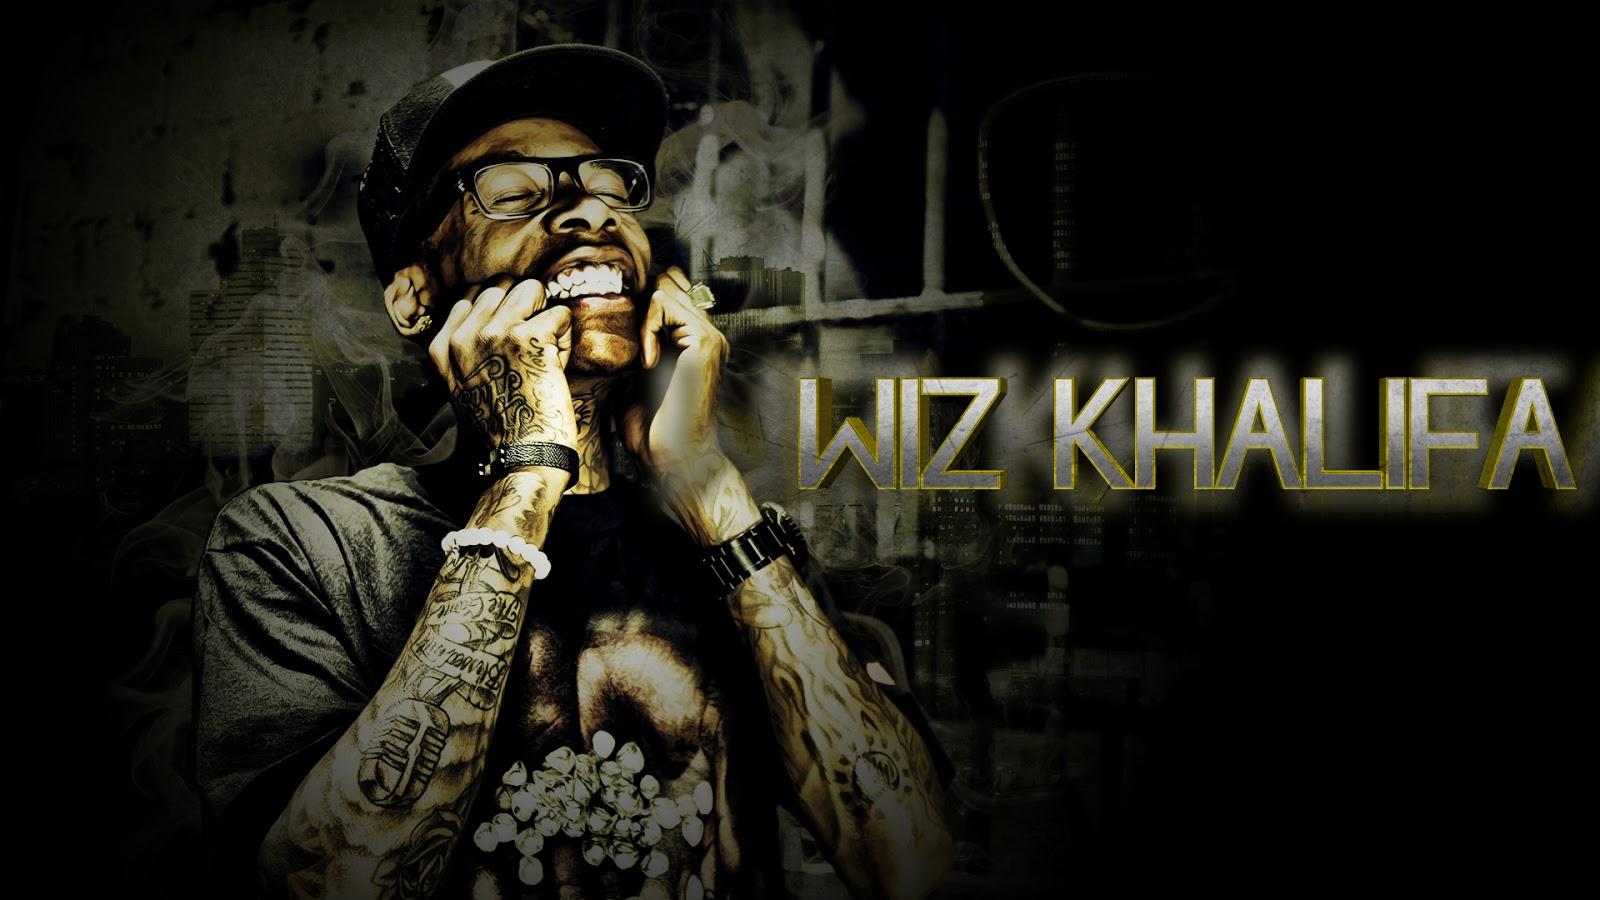 2bpblogspot DIJ2UWthFE0 UKkEWHJWRpI Wiz Khalifa